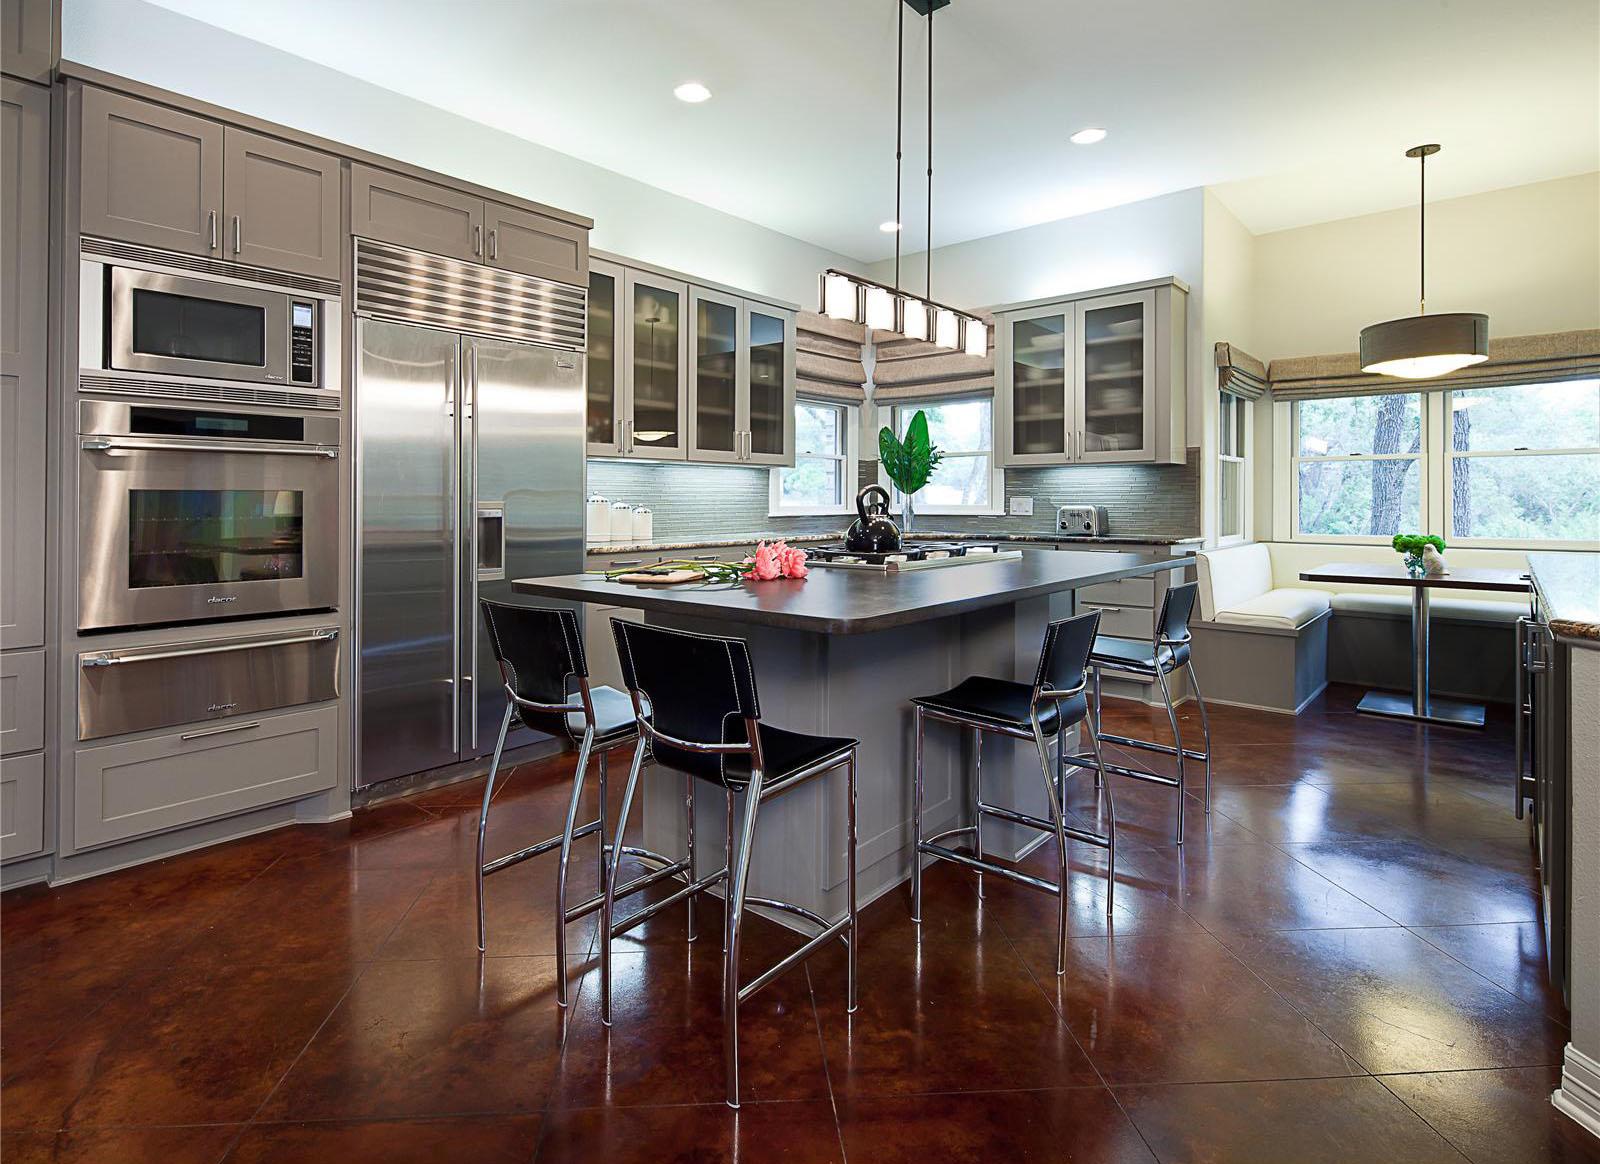 Contemporary kitchen counter stools Photo - 3